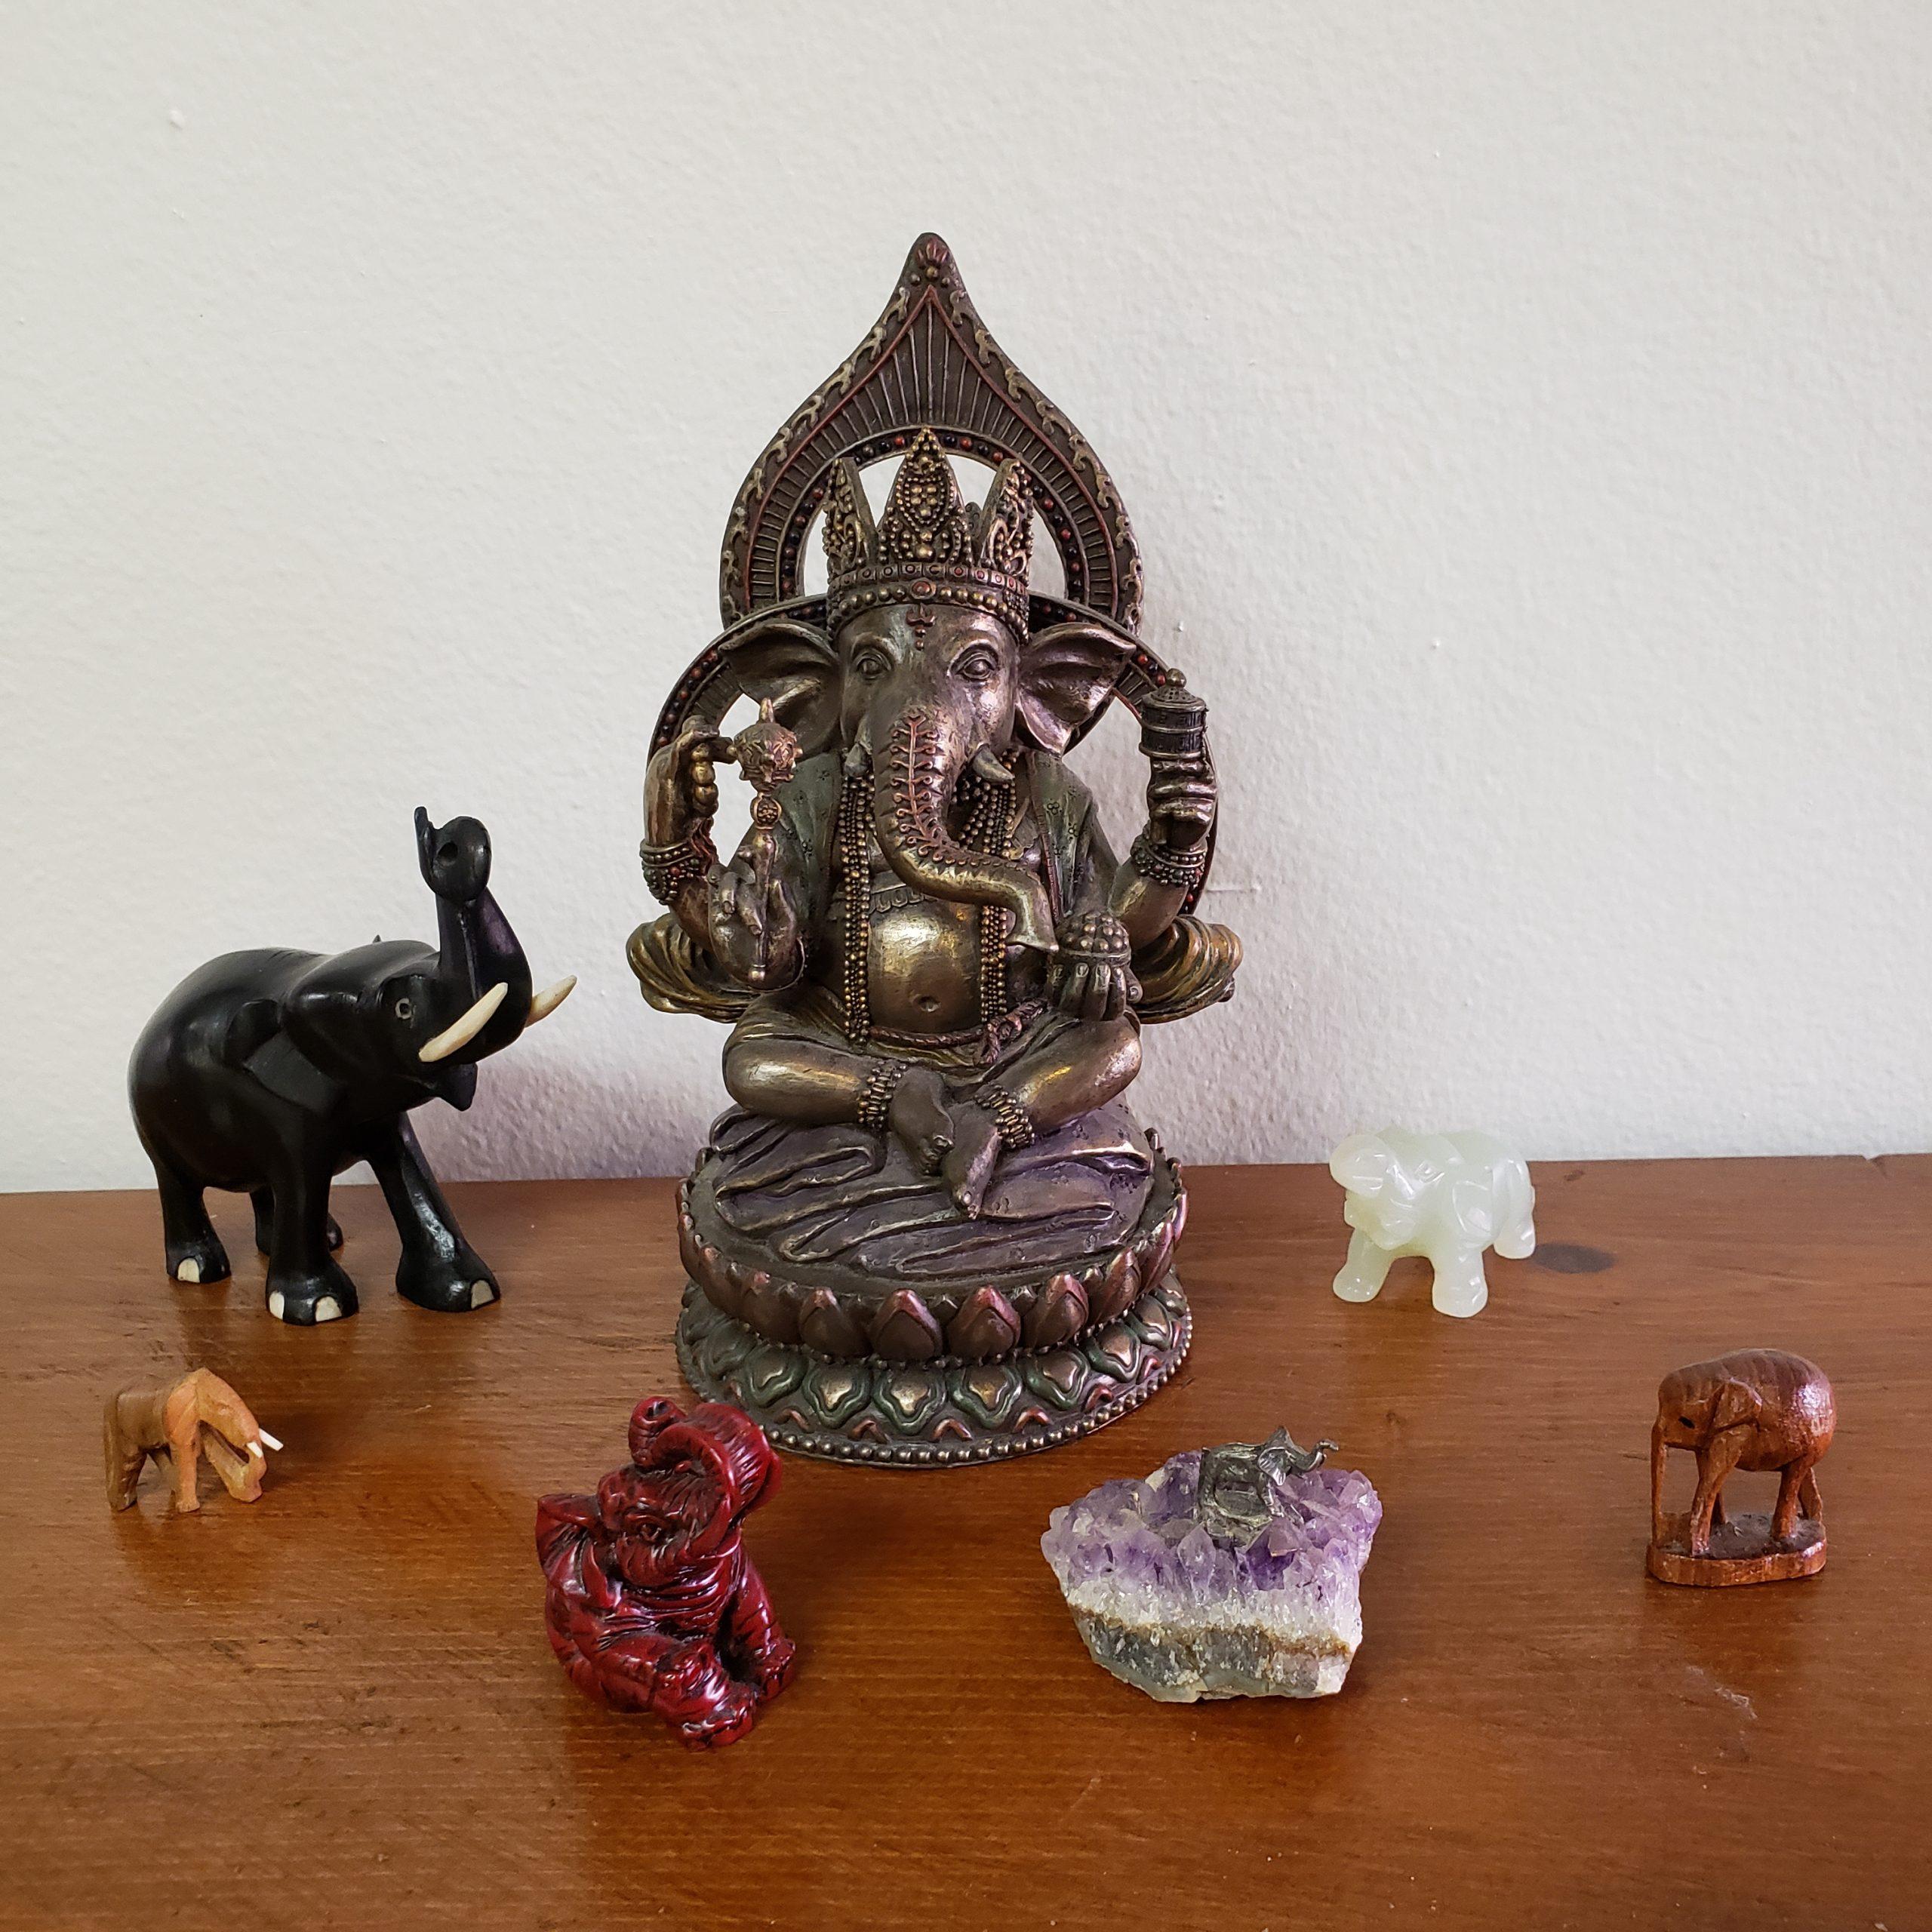 Ganesha and elephant figurines.